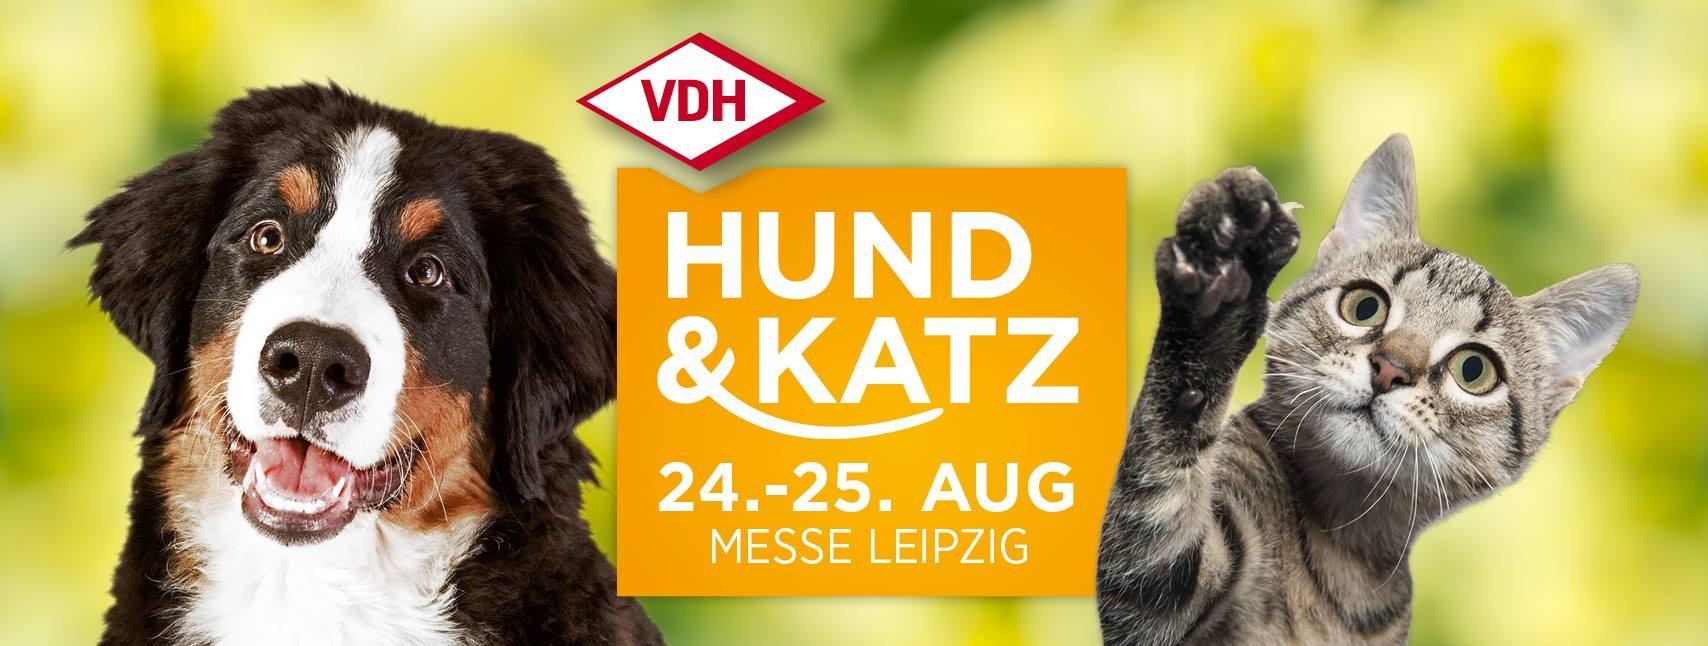 Messe Hund & Katz 2019